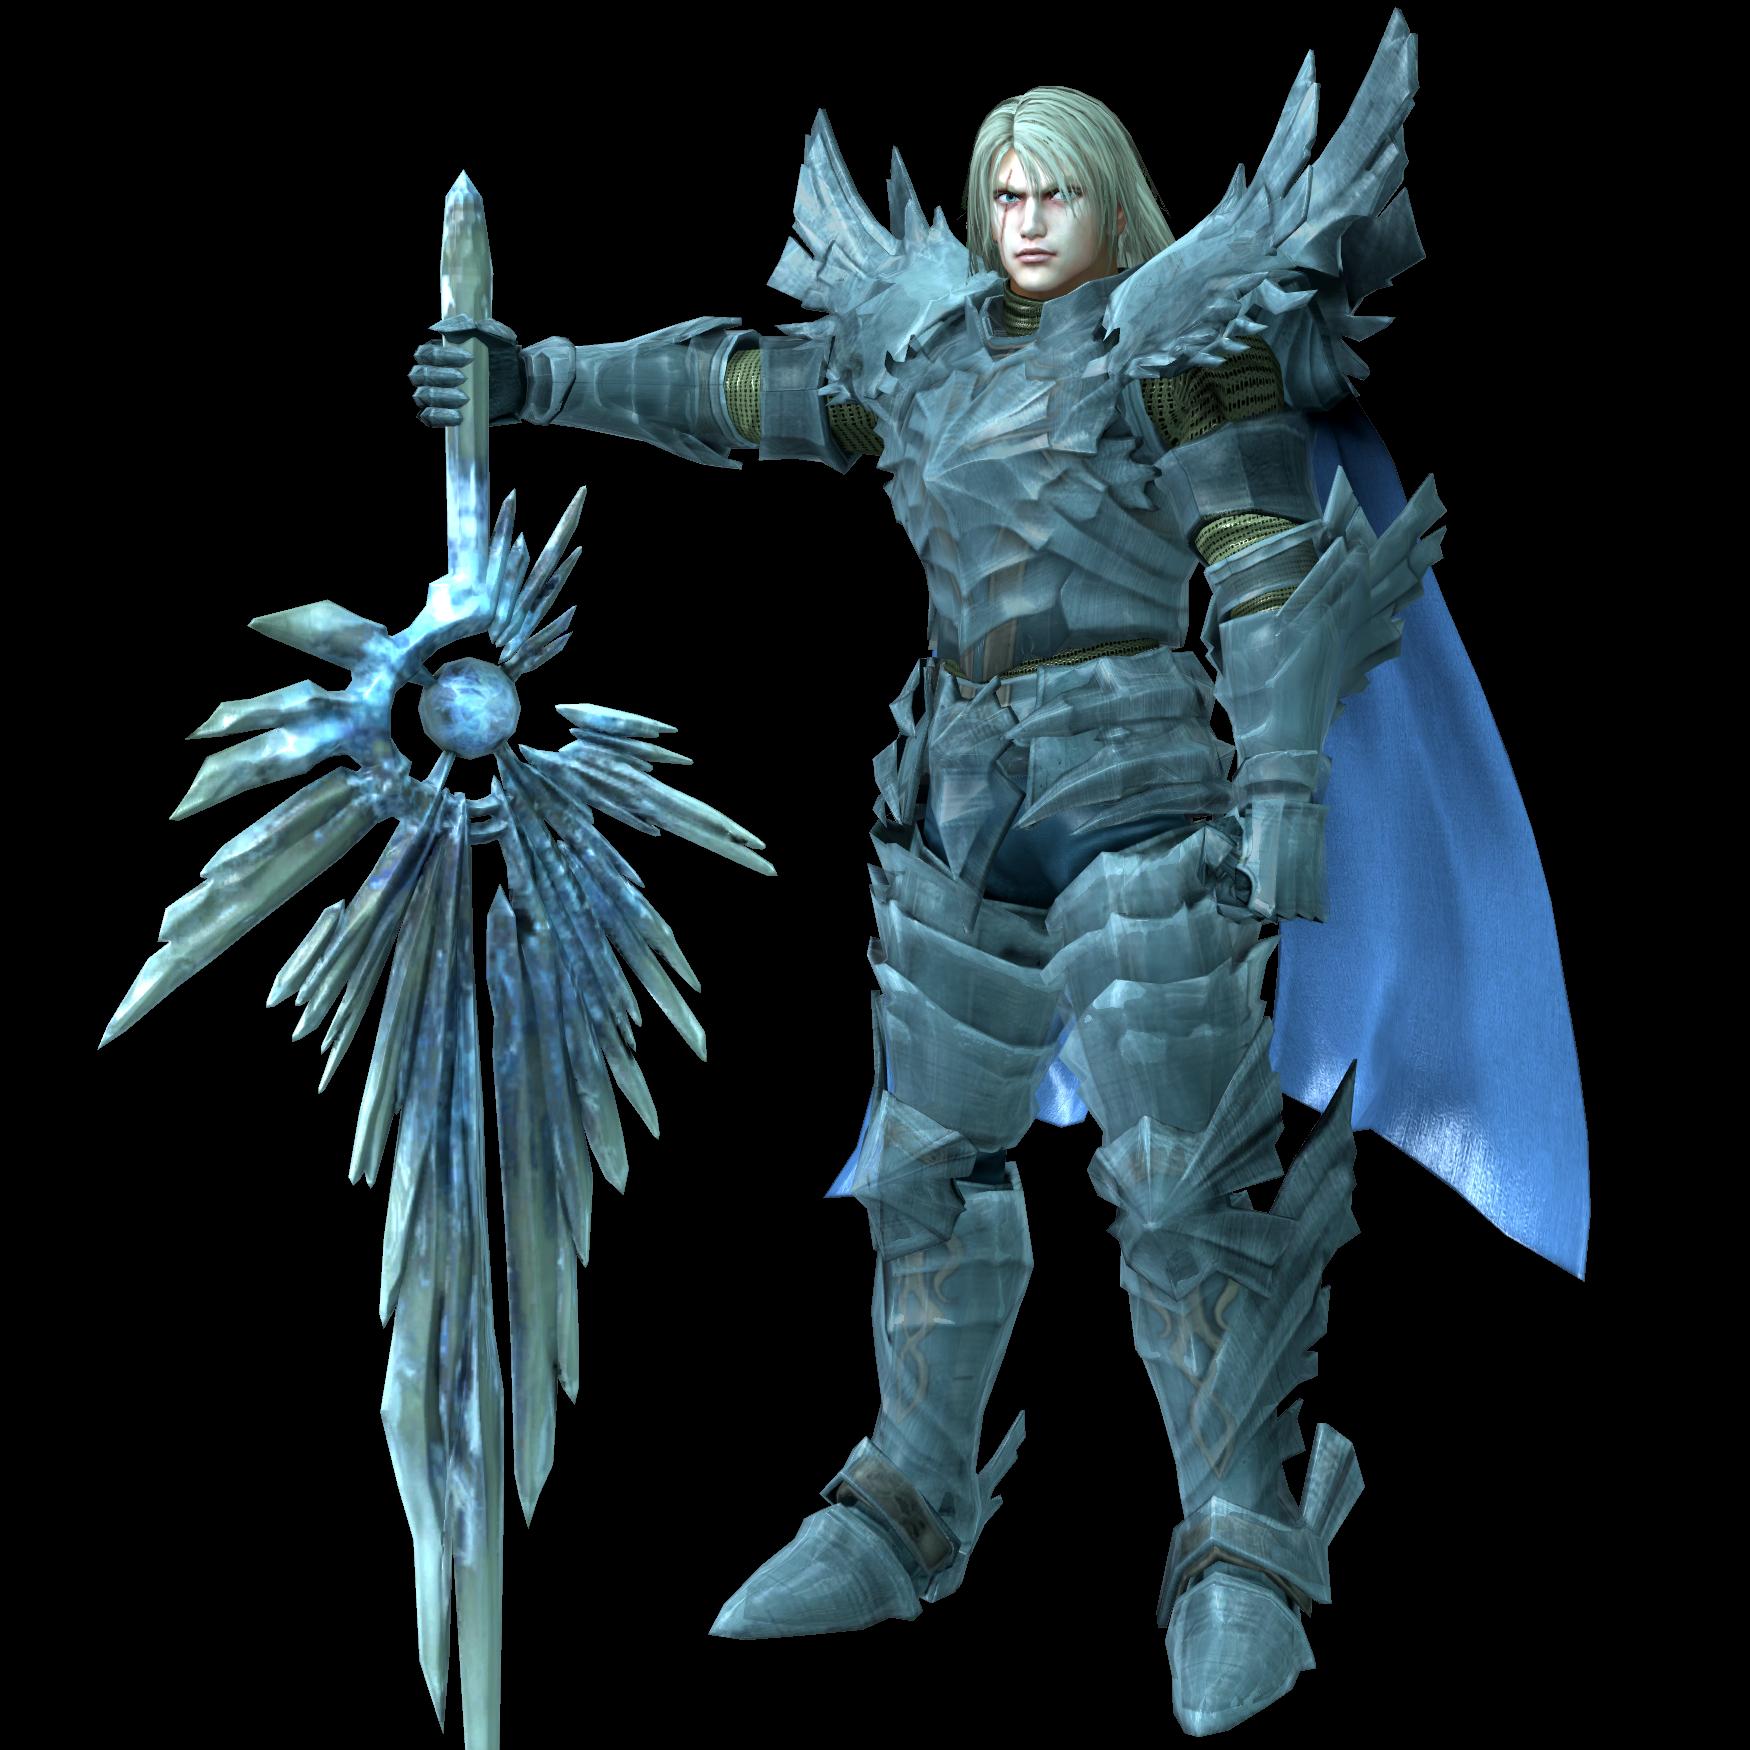 Warriors Orochi 4 Soul Calibur: Destiny Will Tell